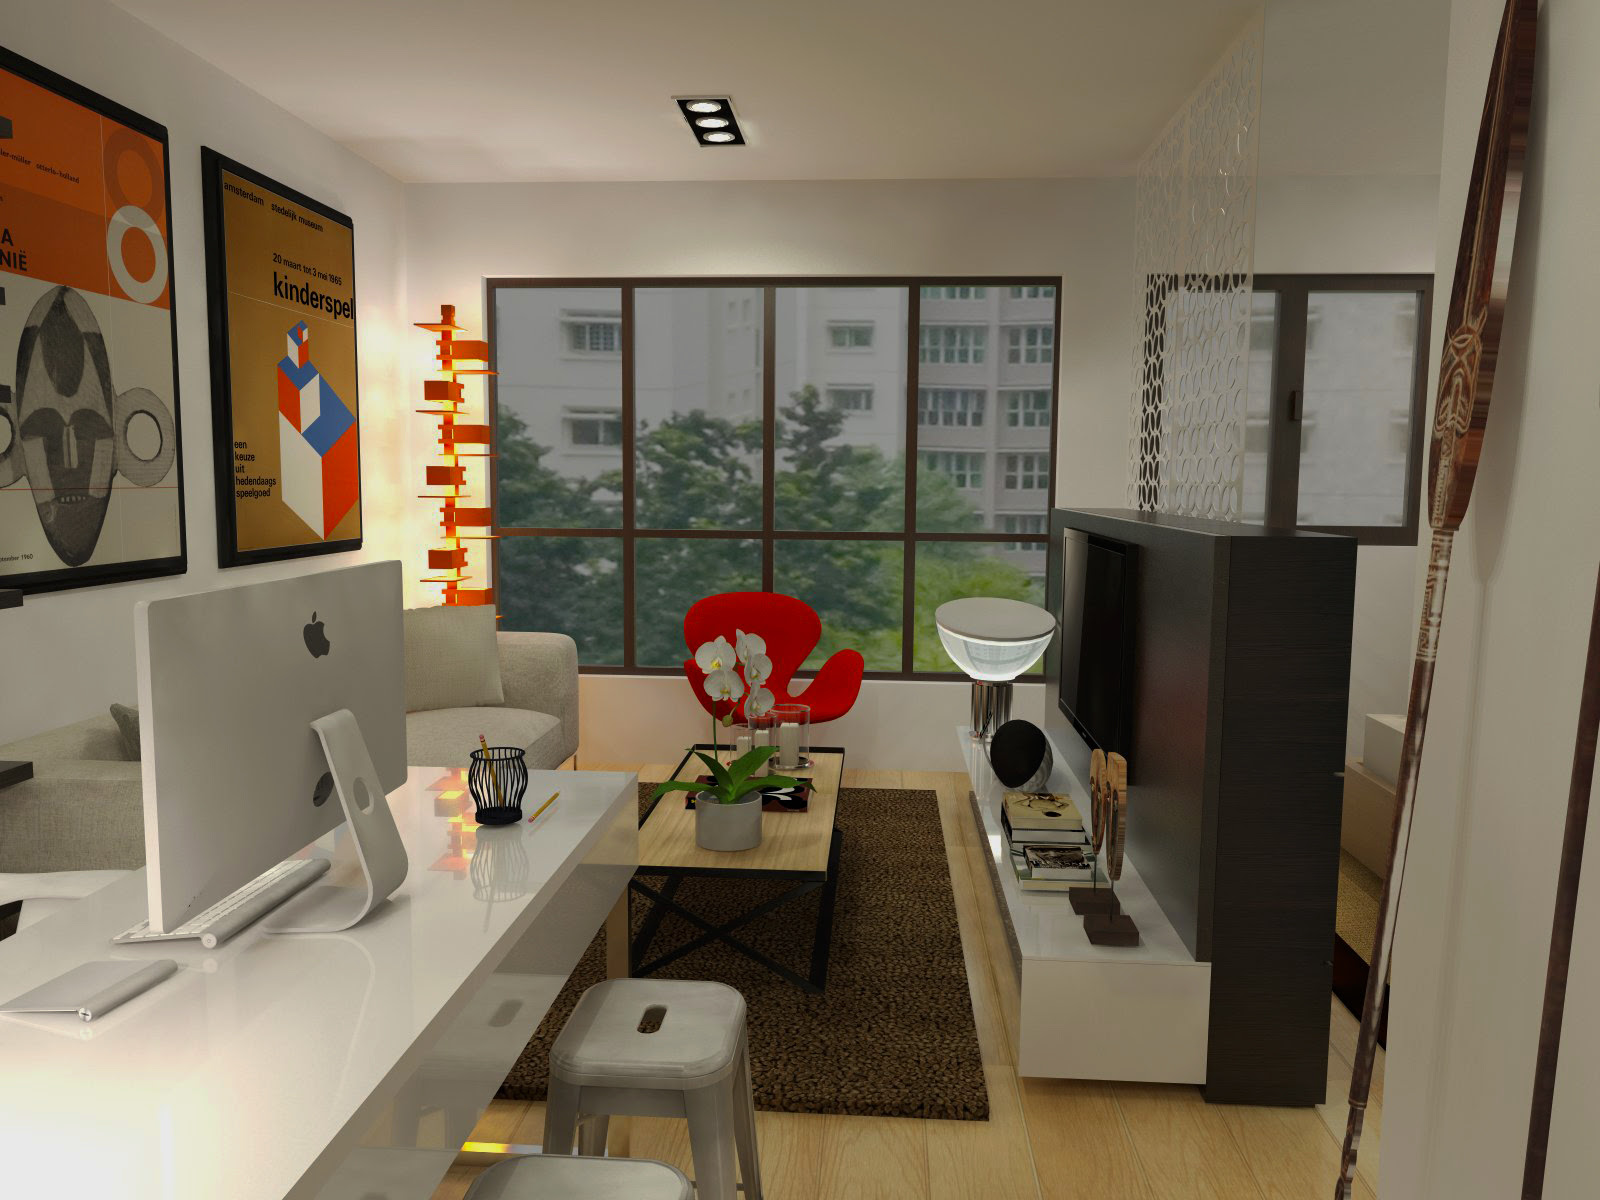 HDB Fernvale River Walk 2 Room Apartment 47 sqm Living Room HDRI